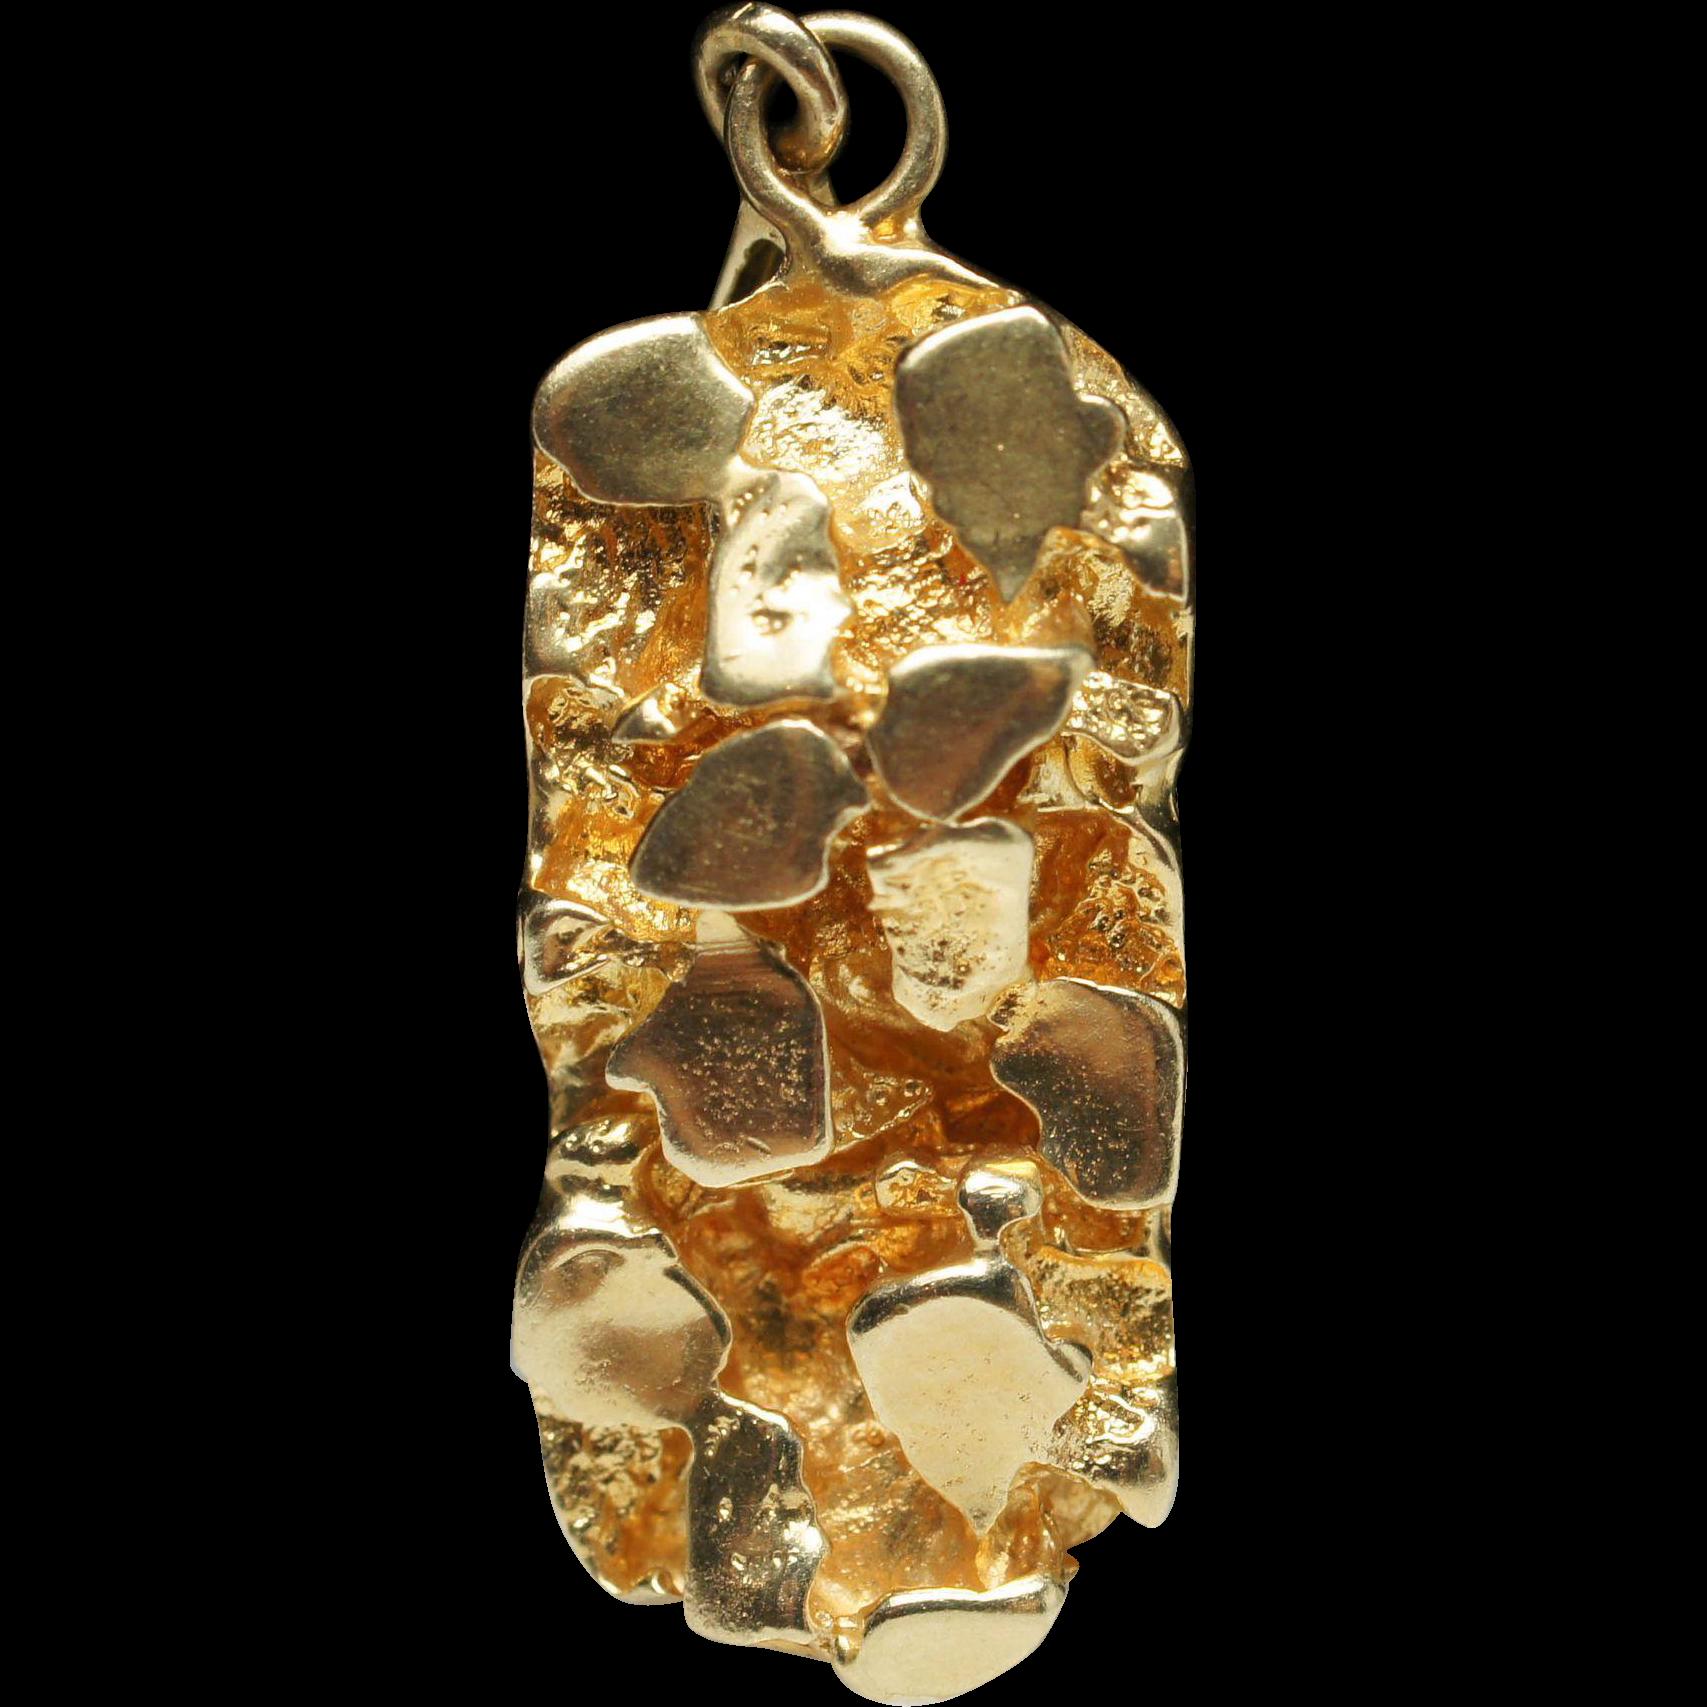 Gold Nuggets Png Image Gold Nugget Gold Nugget